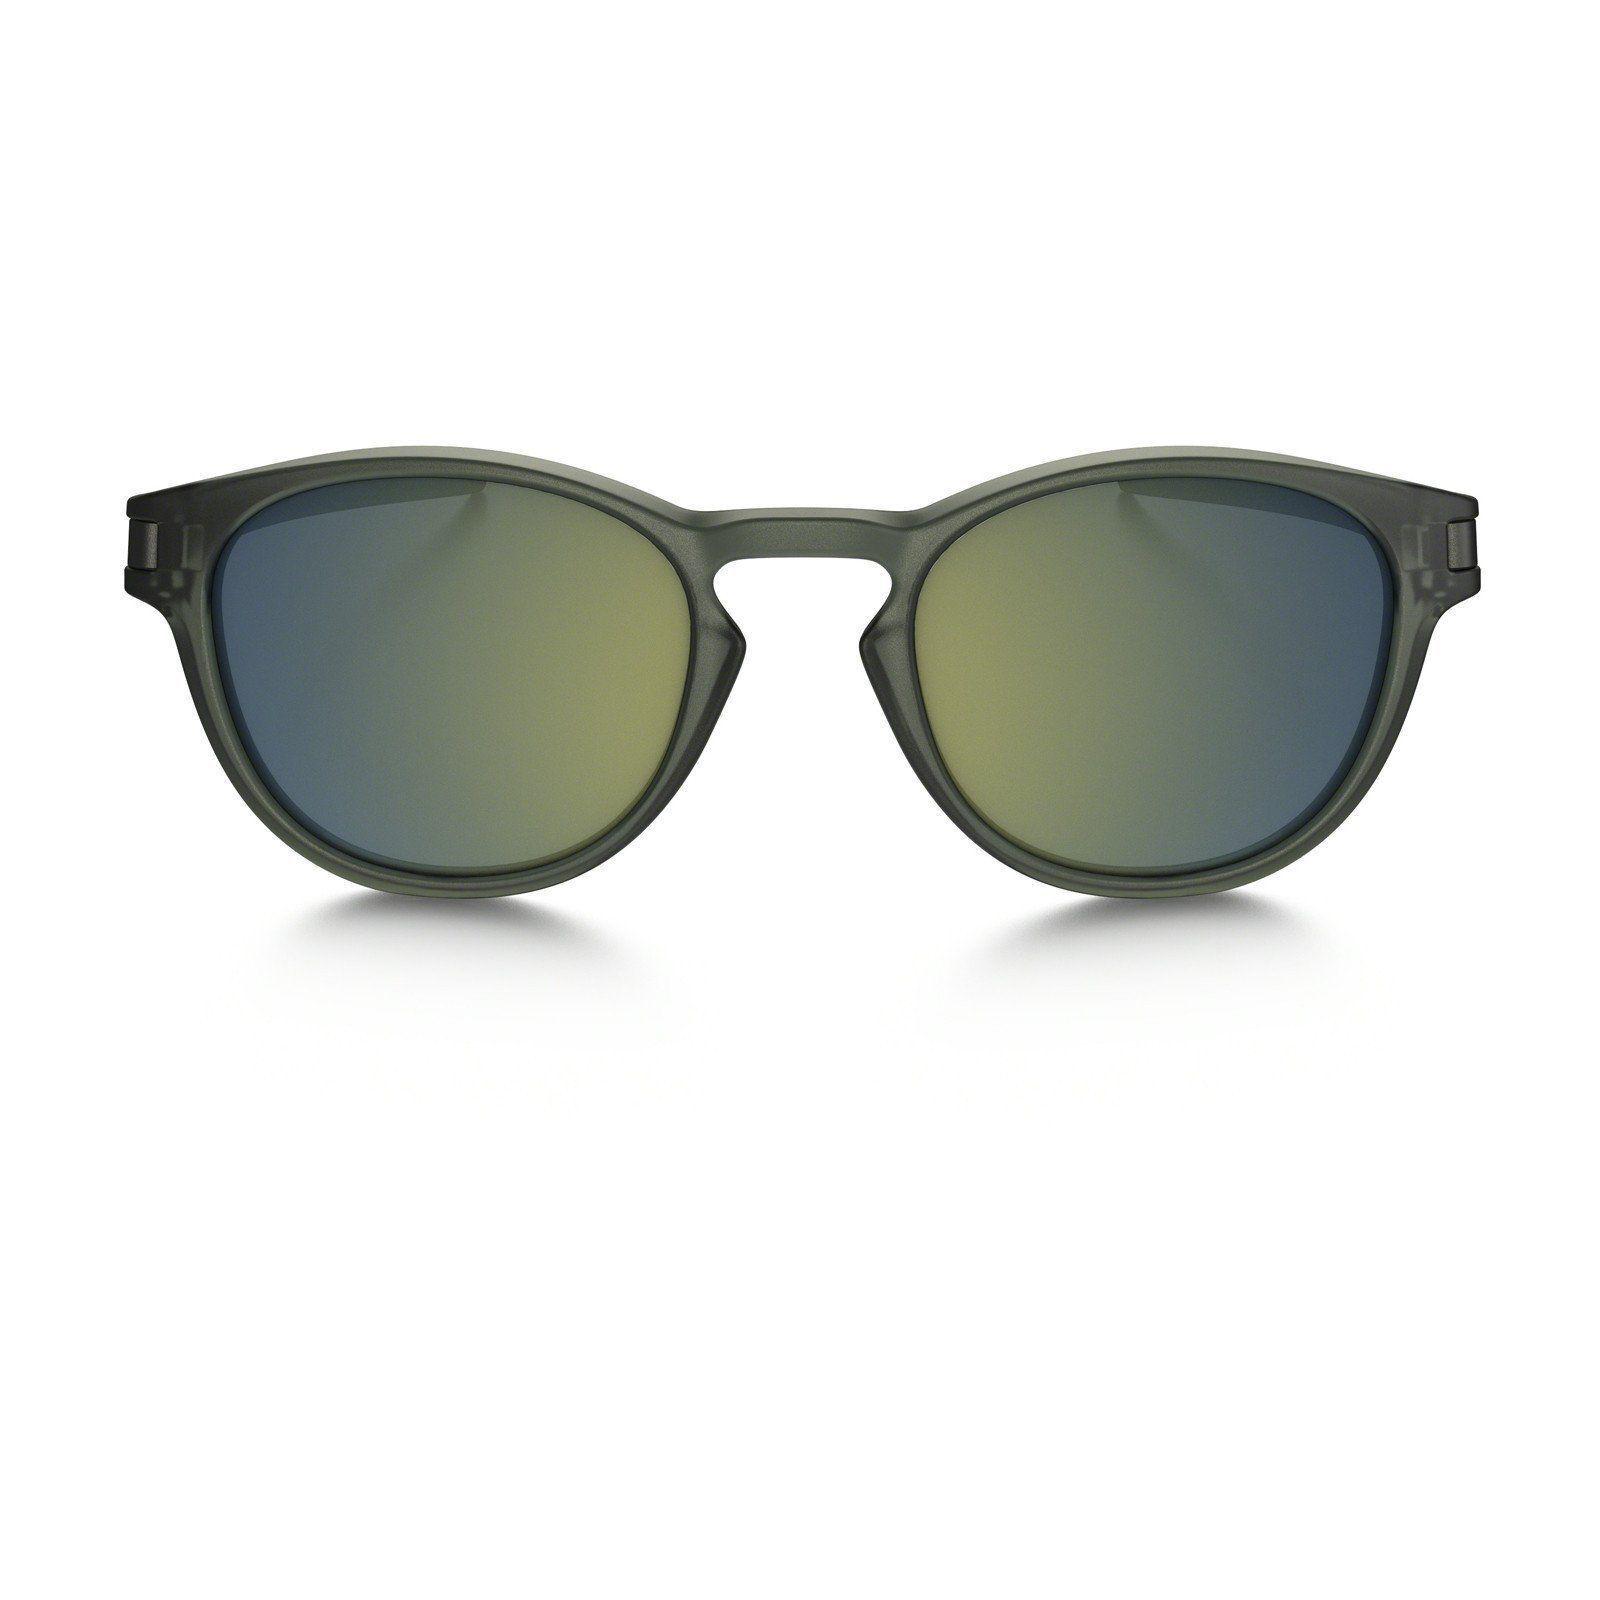 0731737bd1 Oakley Sunglasses Latch Matte Olive Ink Emerald Iridium Oo9265-05 ...